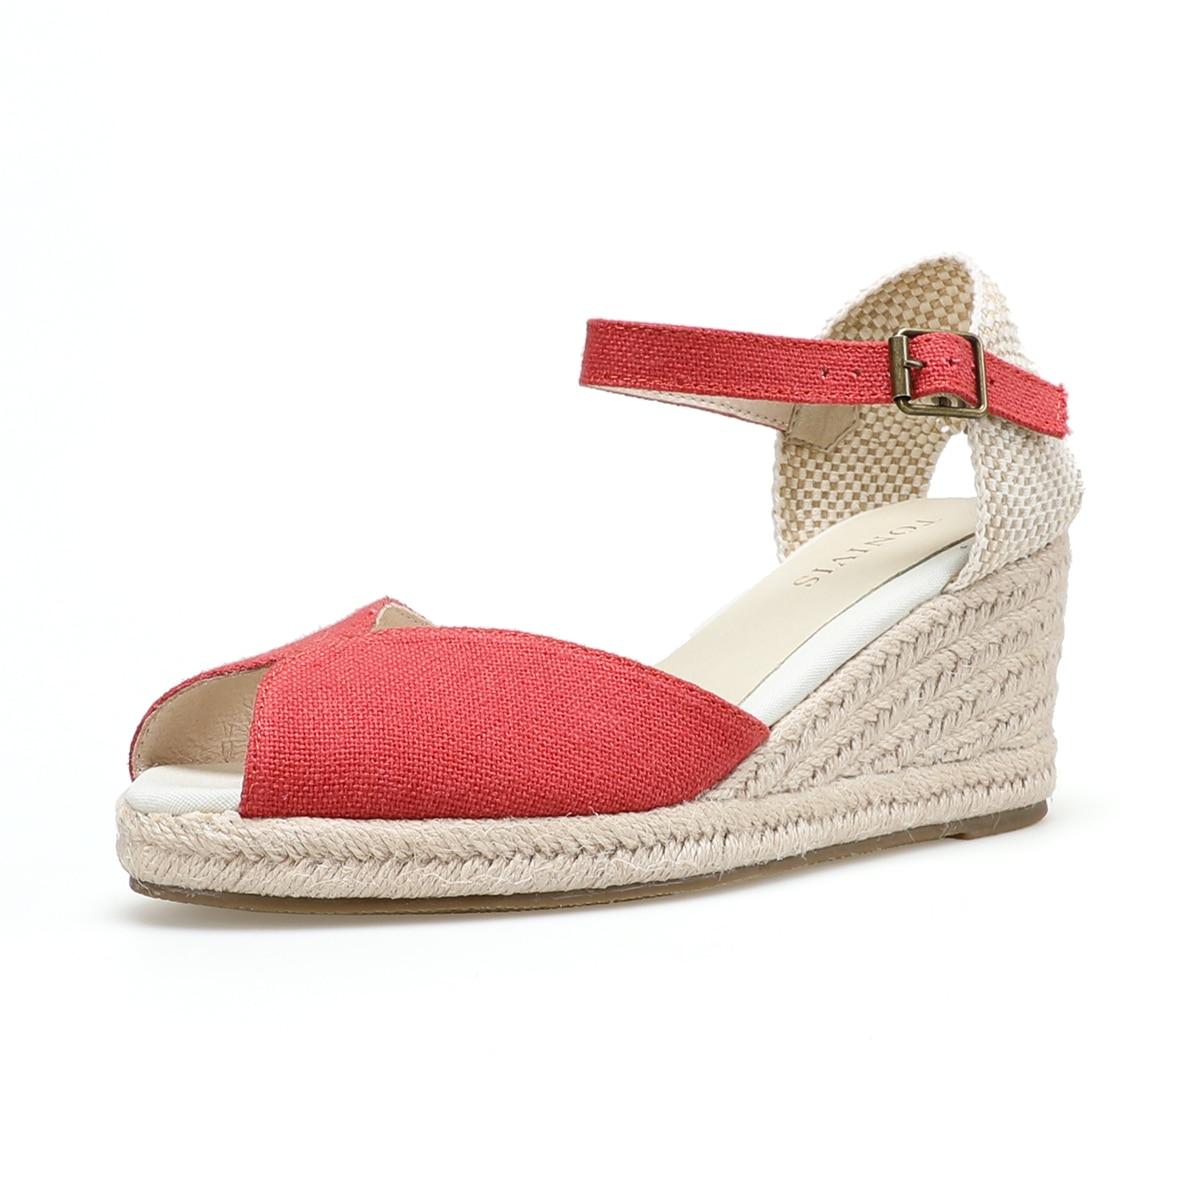 Women's Elastic Ankle Strap Espadrilles Wedge Sandals